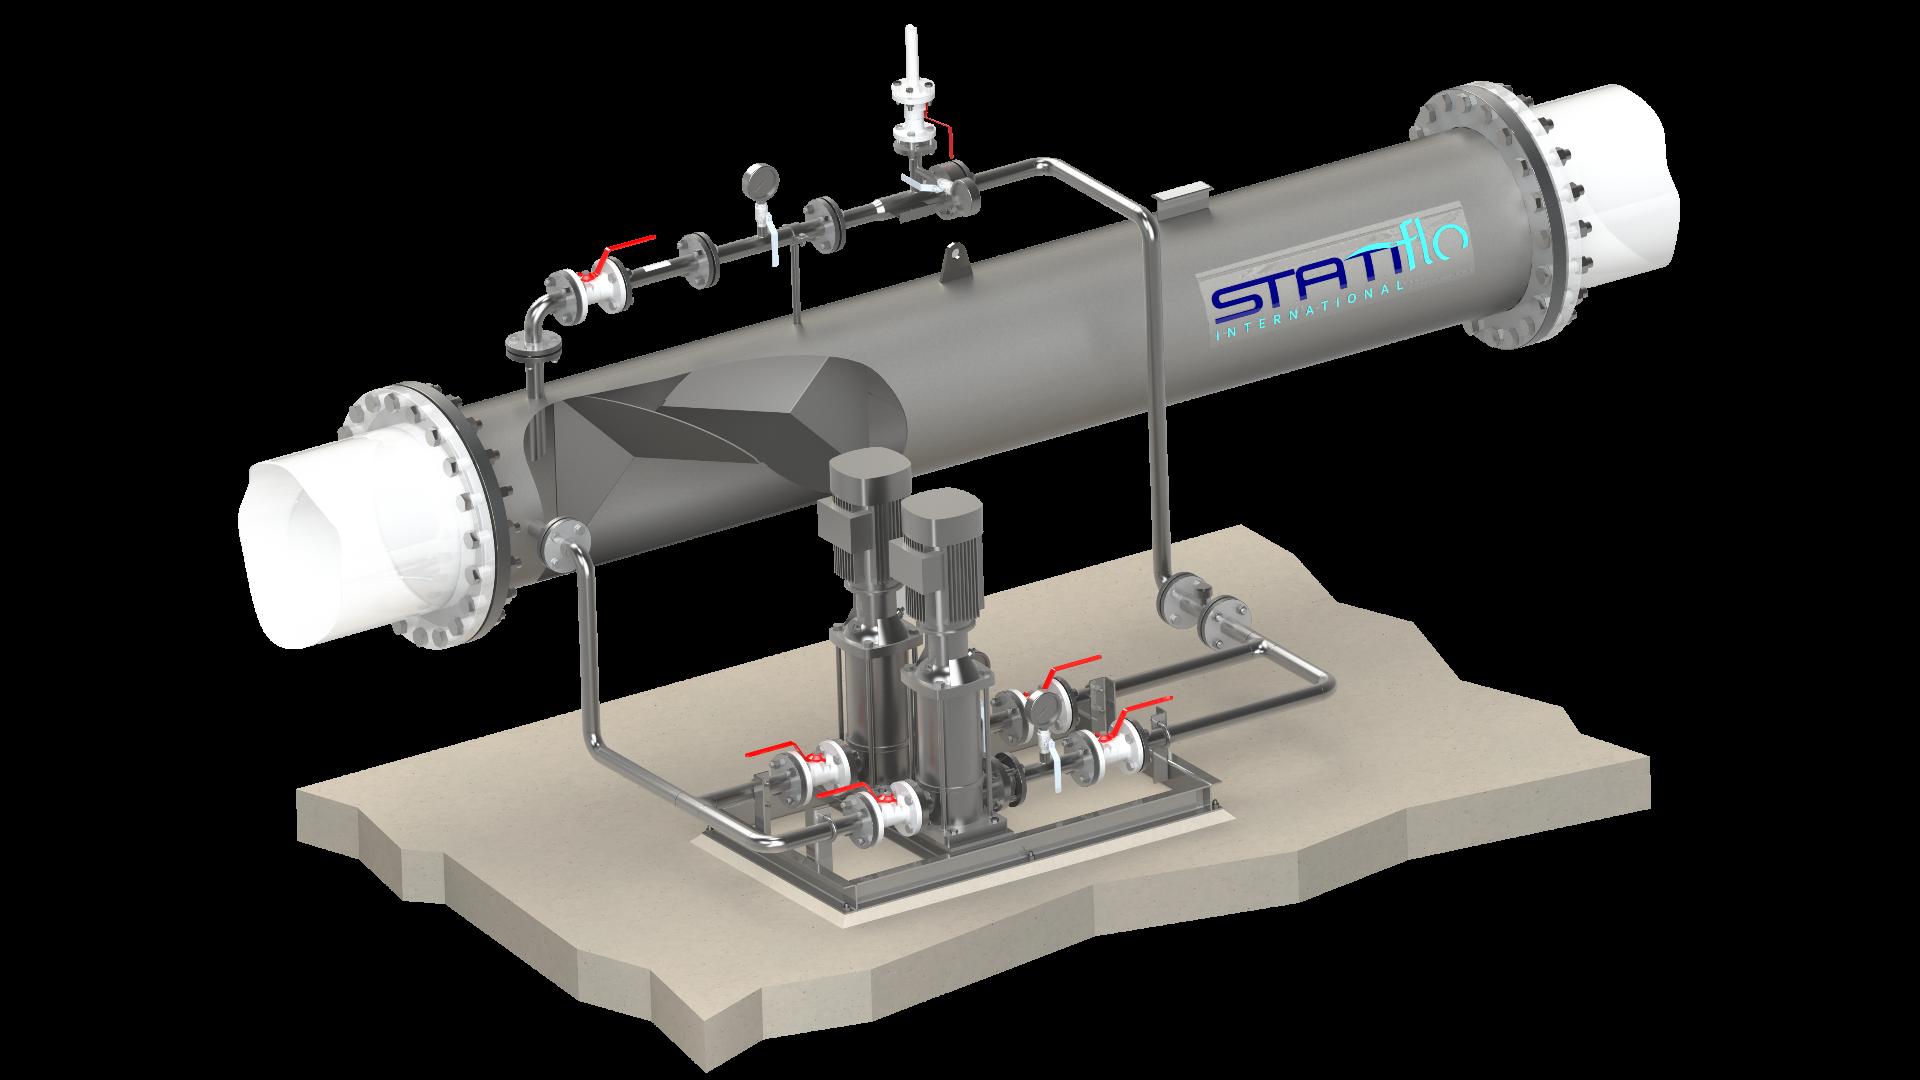 Gallery image 1 - Statiflo Gas Dispersion System (GDS)